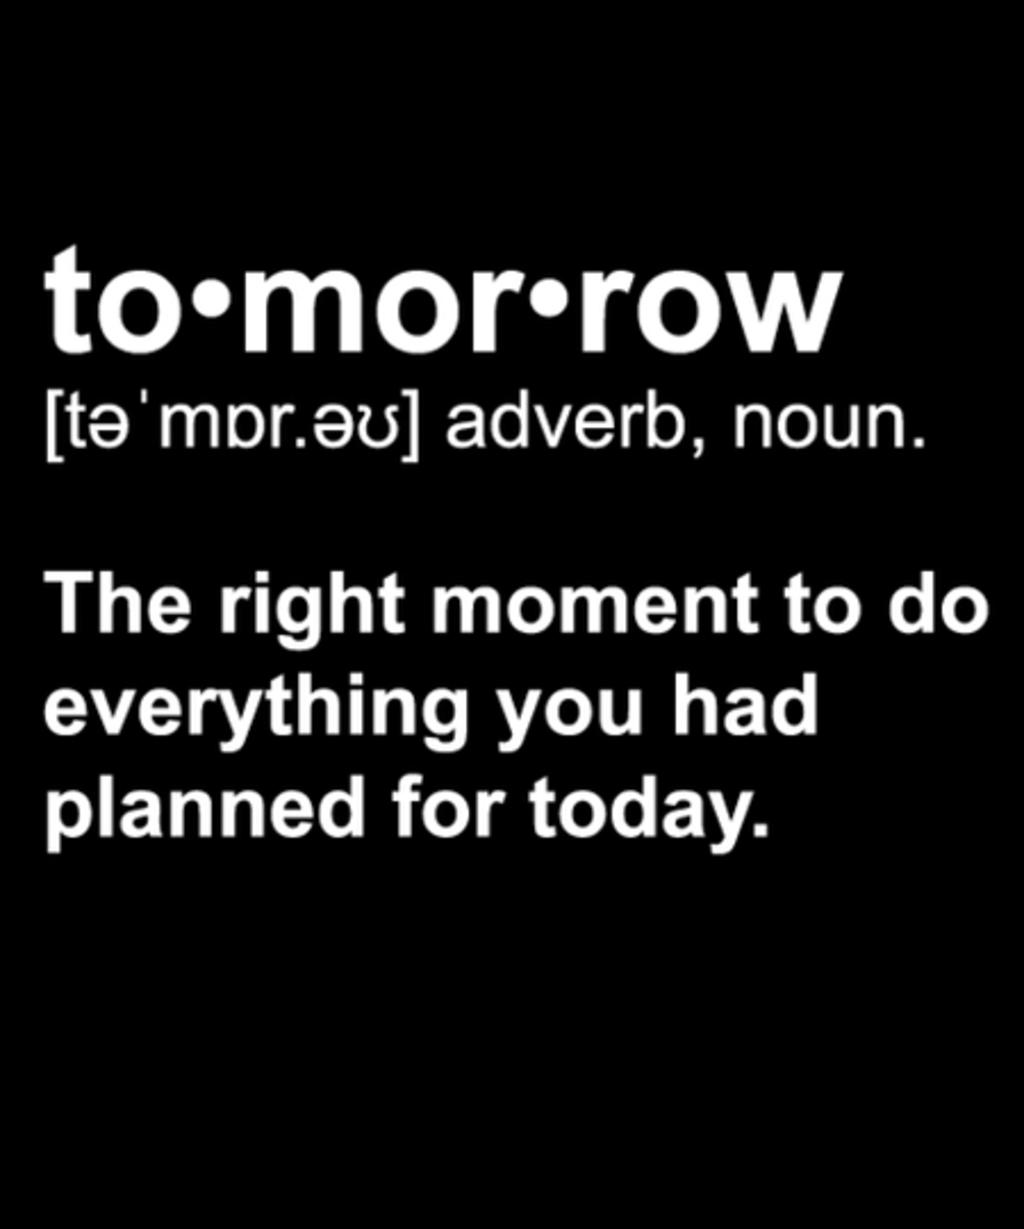 Qwertee: Tomorrow Definition